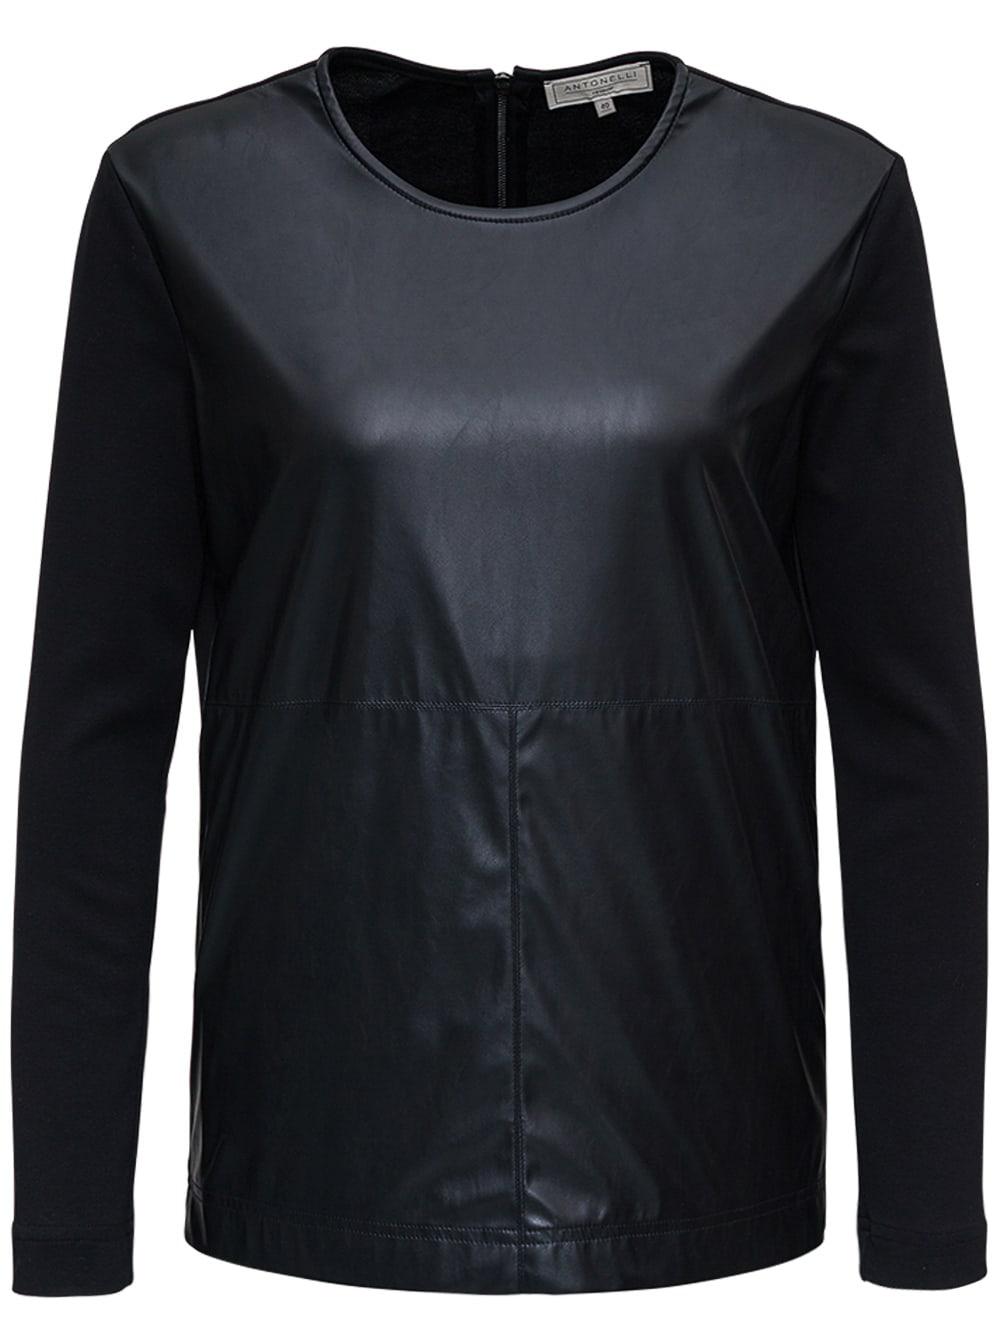 Black Leatheret Crew Neck Sweater